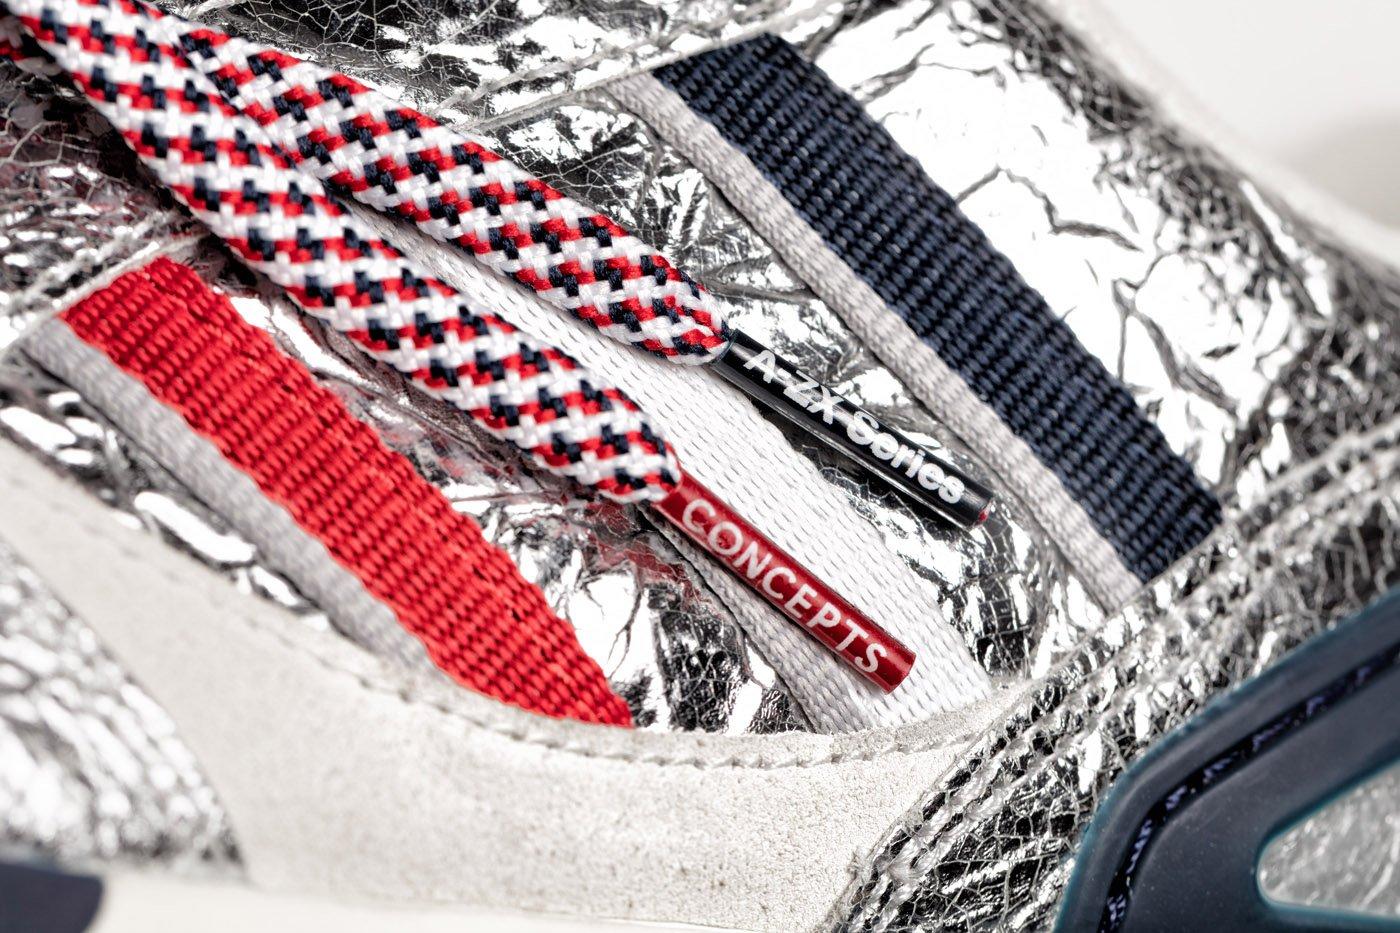 Concepts, Adidas